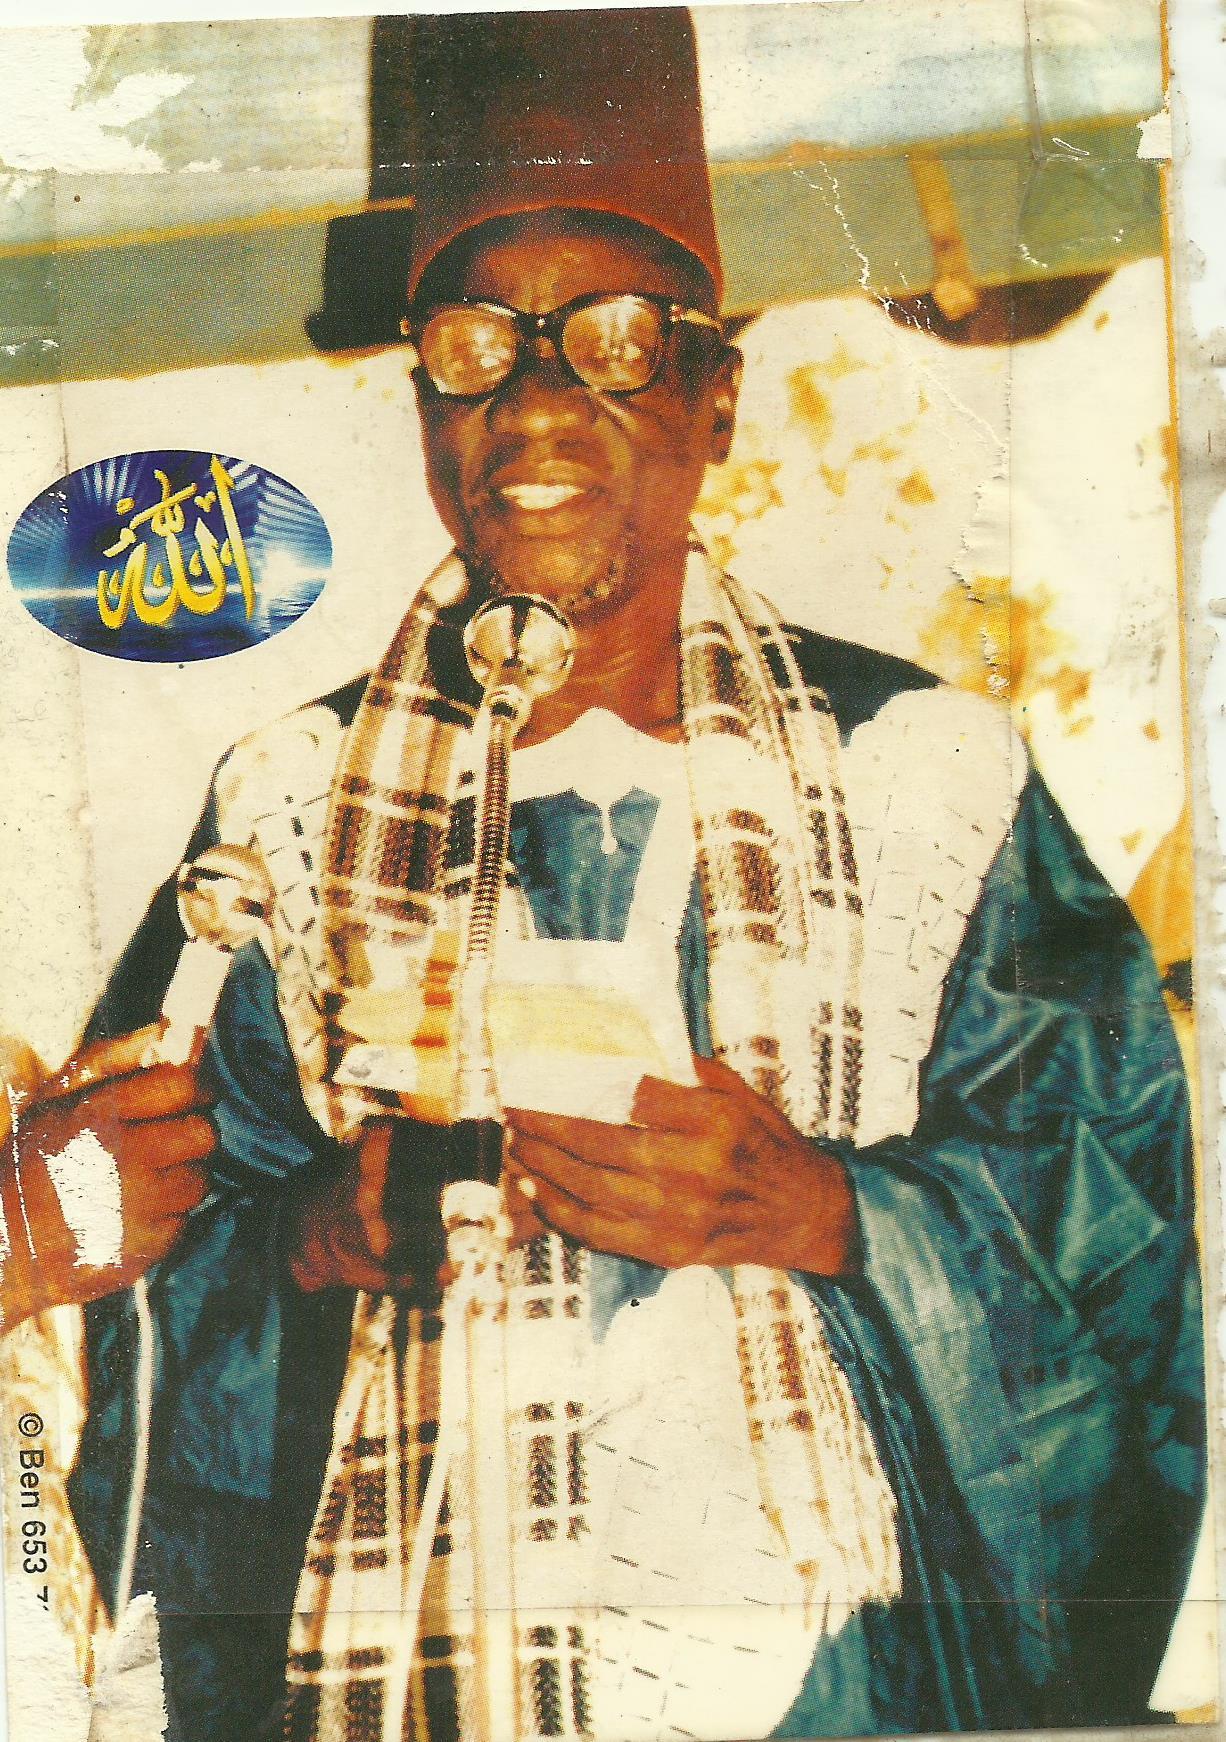 OUAKAM - Journée de Prière à la mémoire de El Hadj Boubou Ndiaye Samb,  Samedi 12 Mars 2016